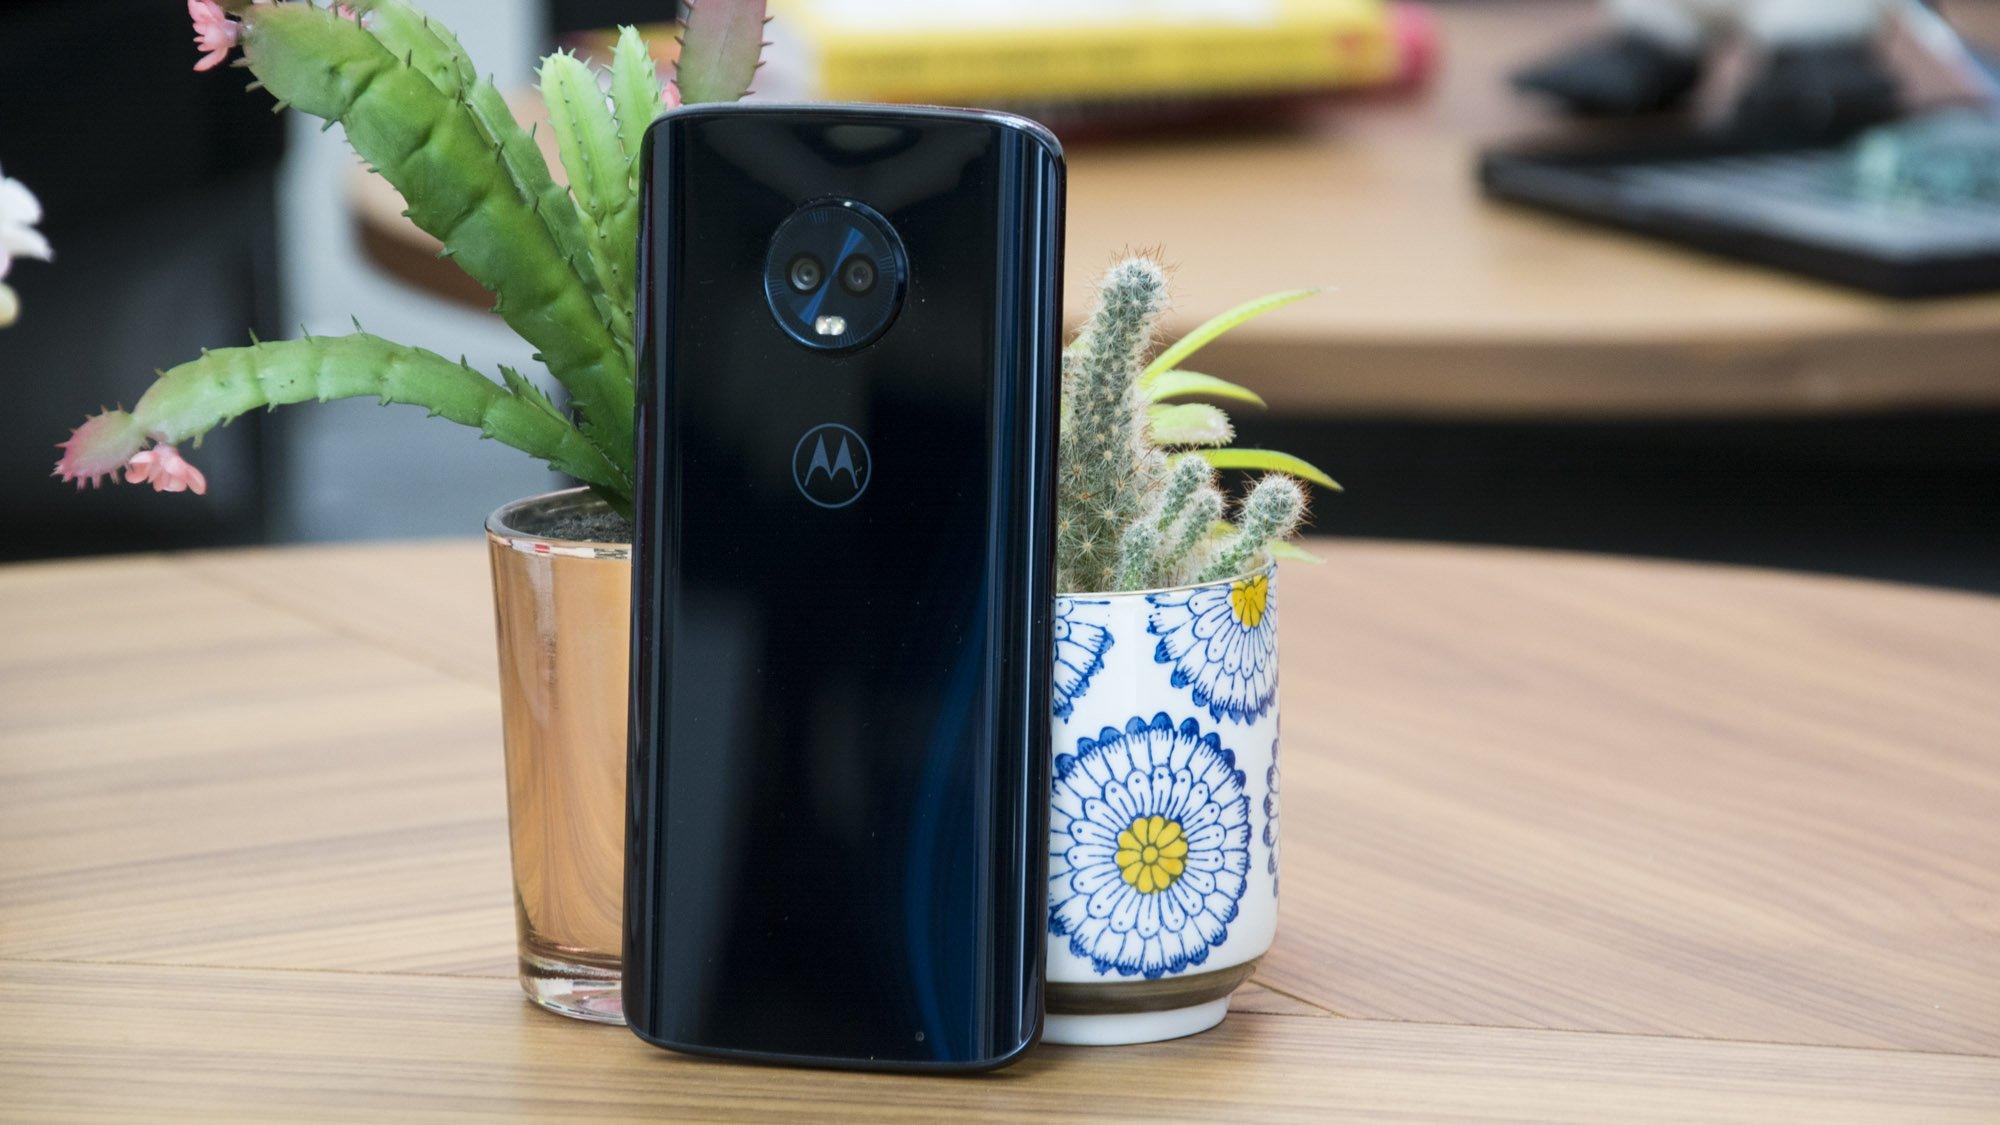 Revisión de Moto G6 Plus: otro teléfono de Motorola 1